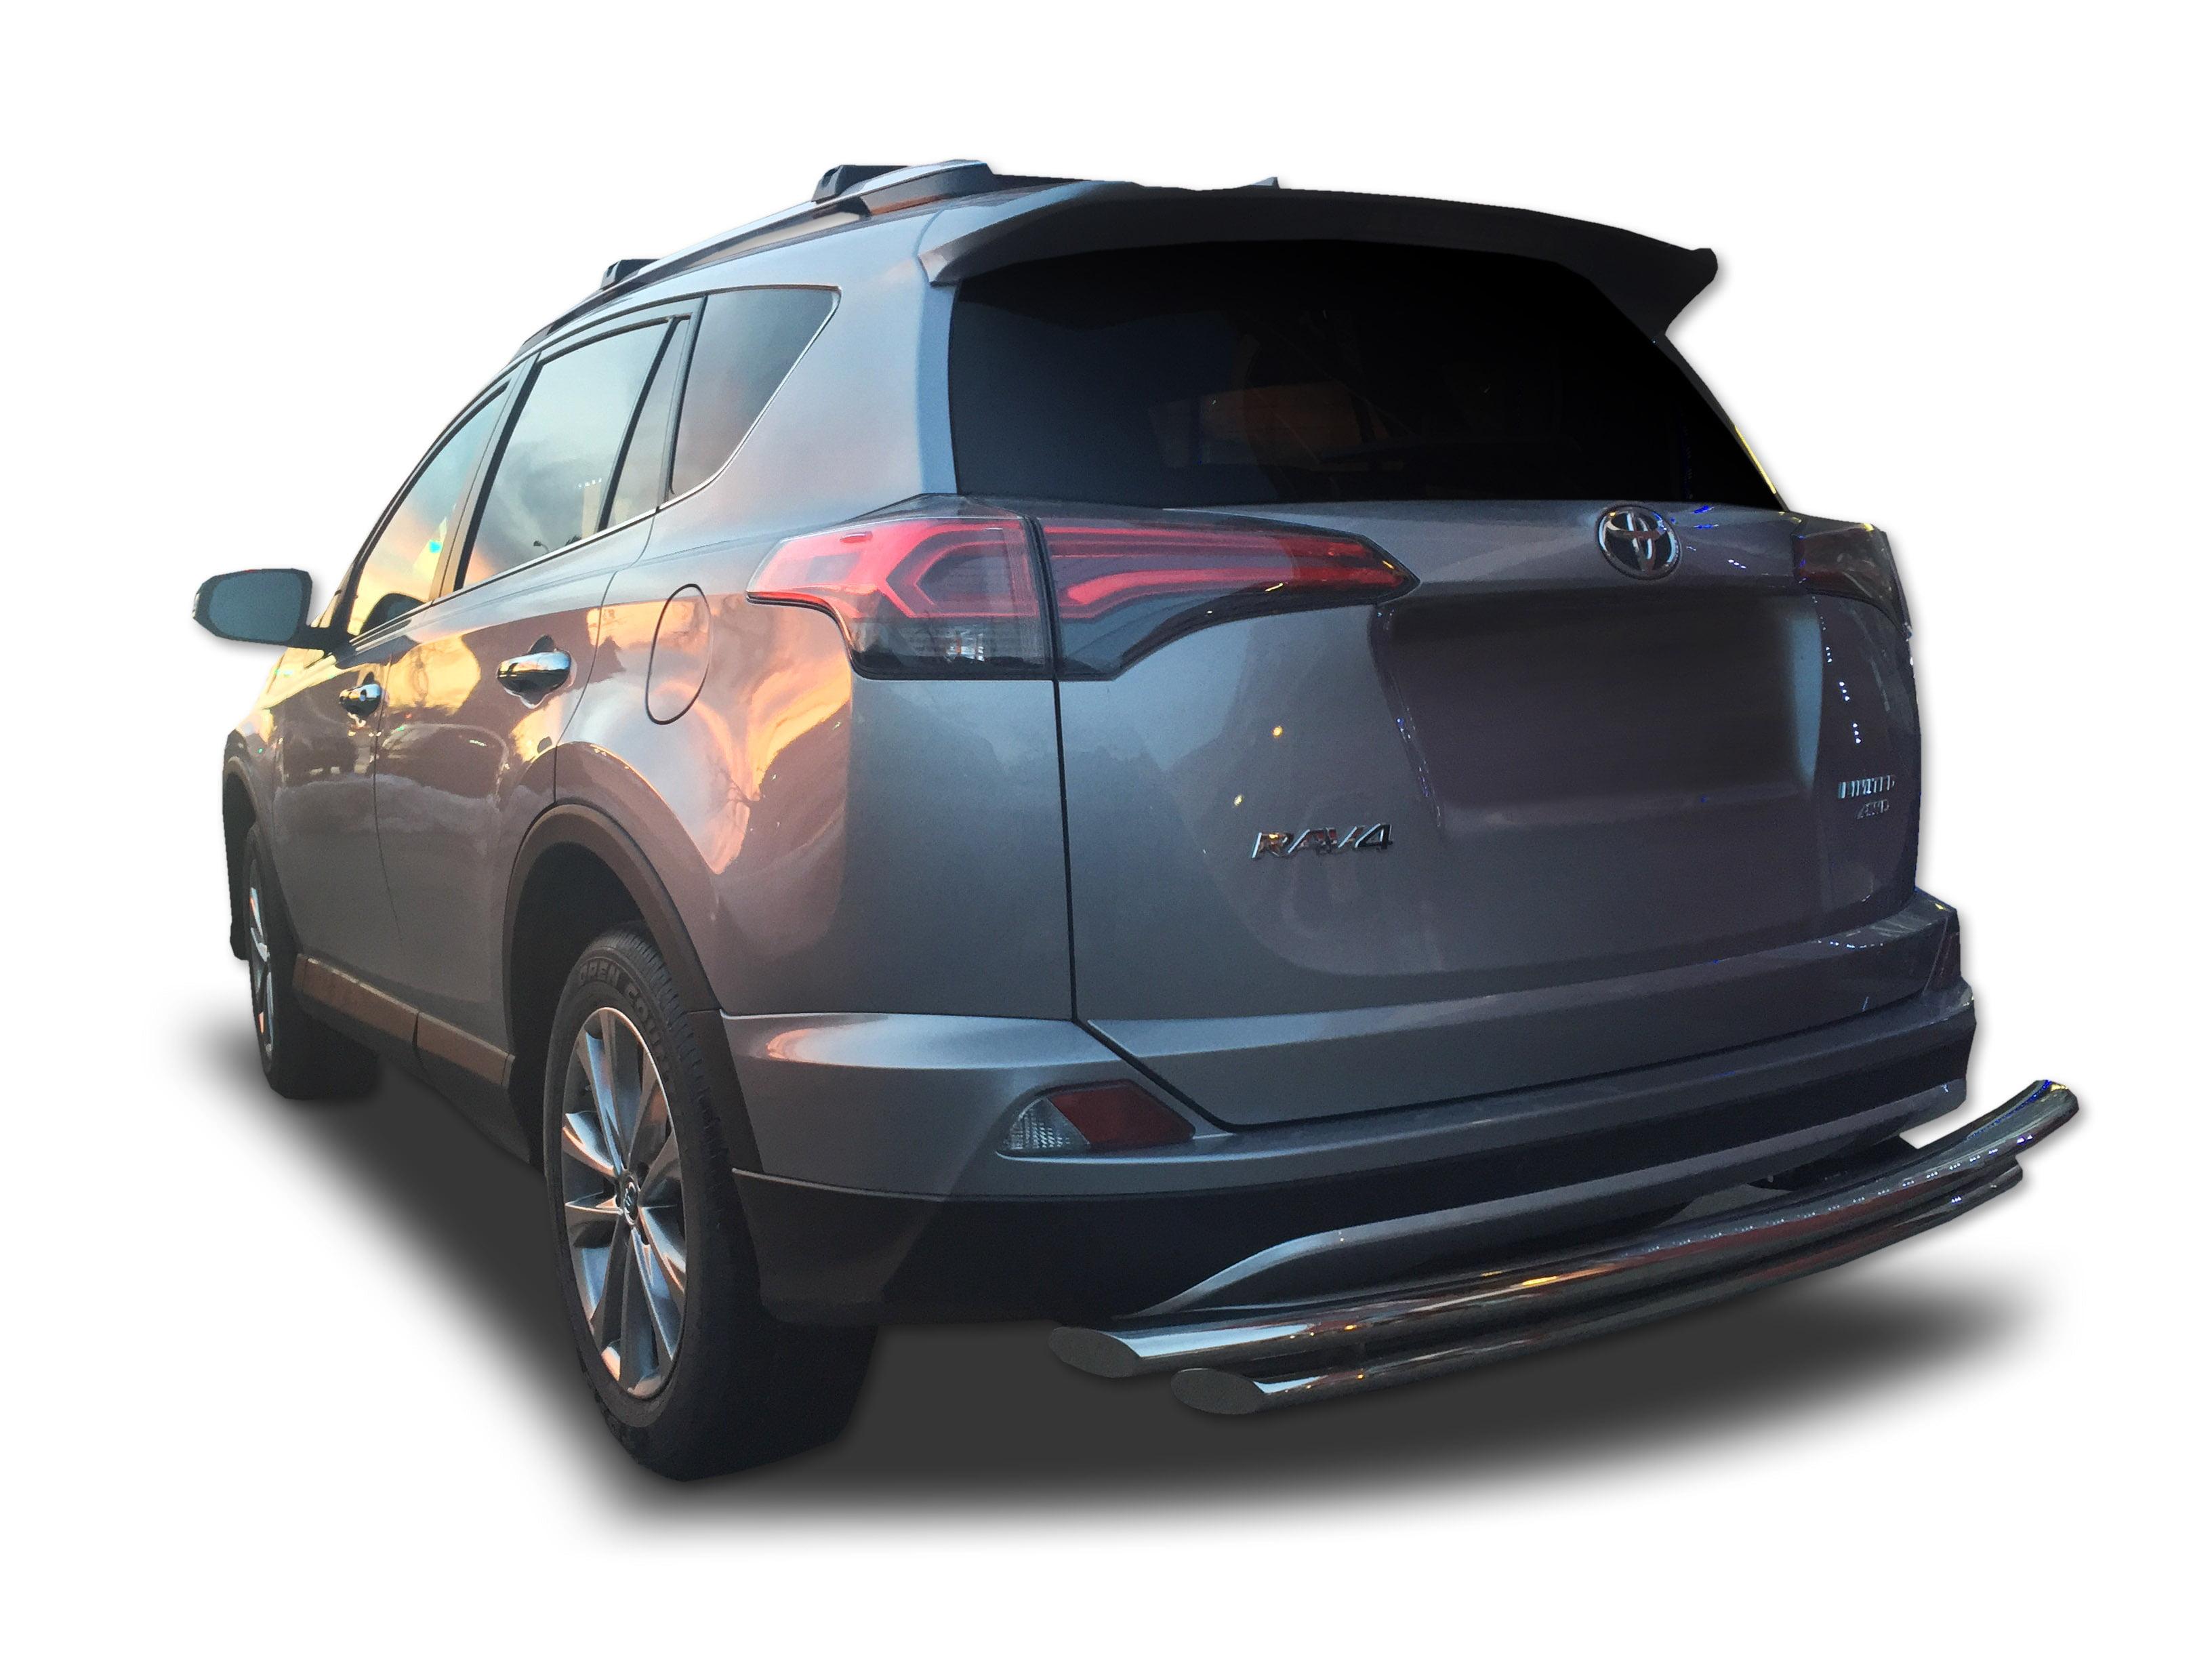 stainless steel Genuine Toyota RAV4 Rear bumper protection plate